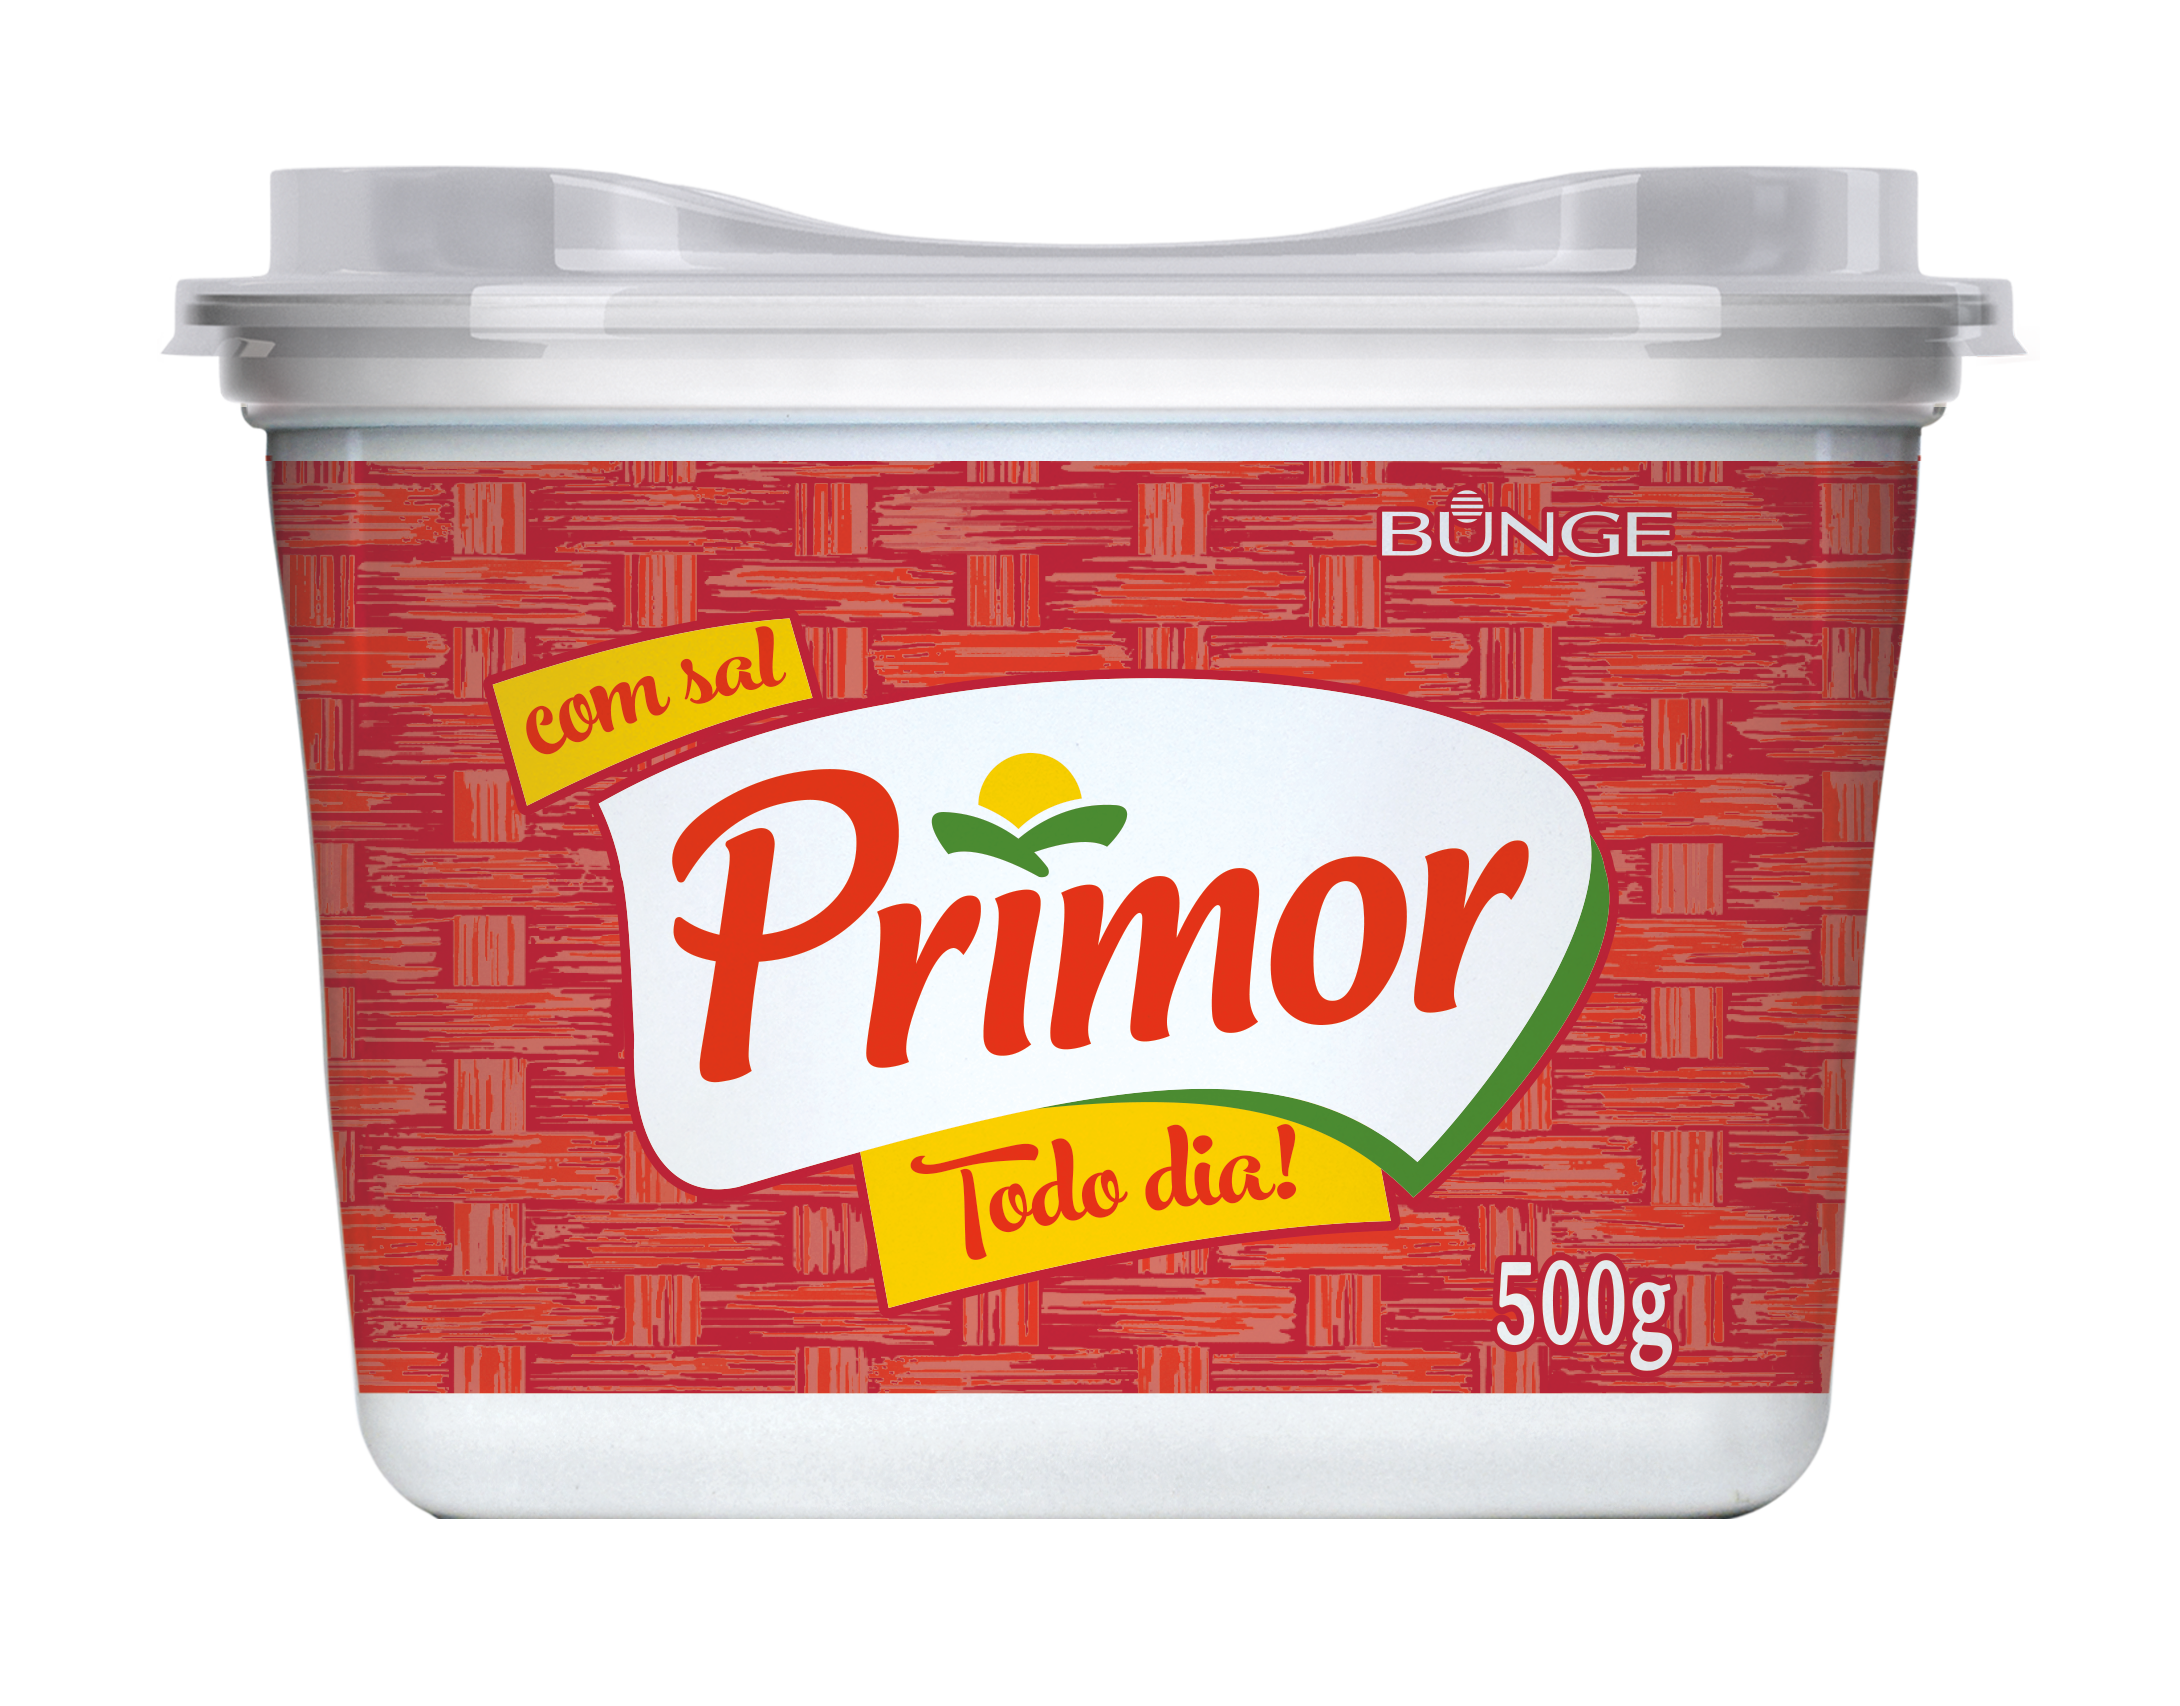 MARGARINA PRIMOR TODO DIA 500G COM SAL